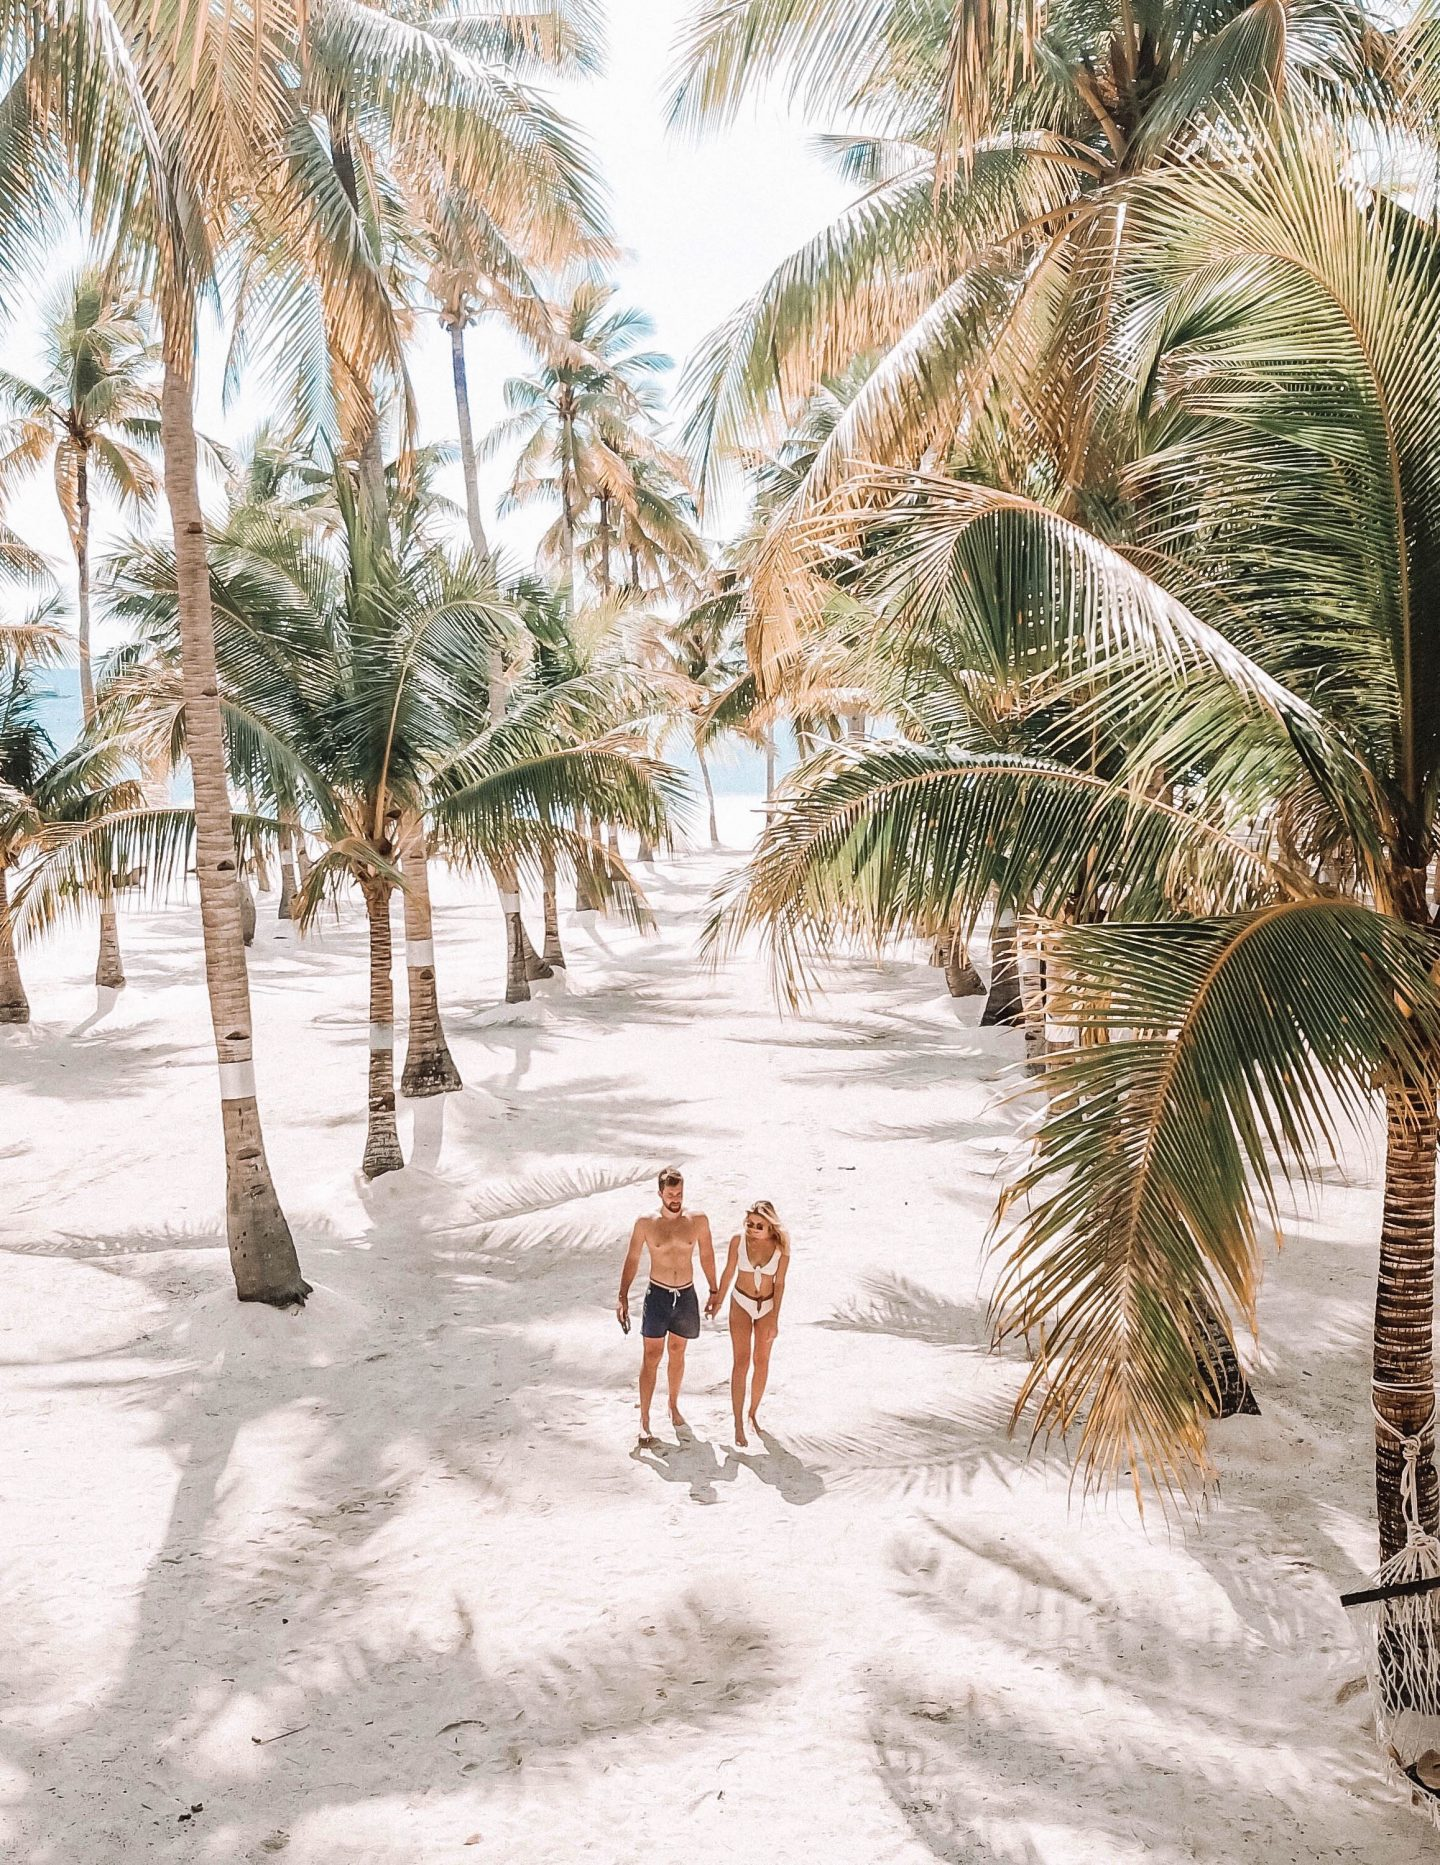 Visiter Bohol Philippines - Blondie Baby blog mode Paris et voyages